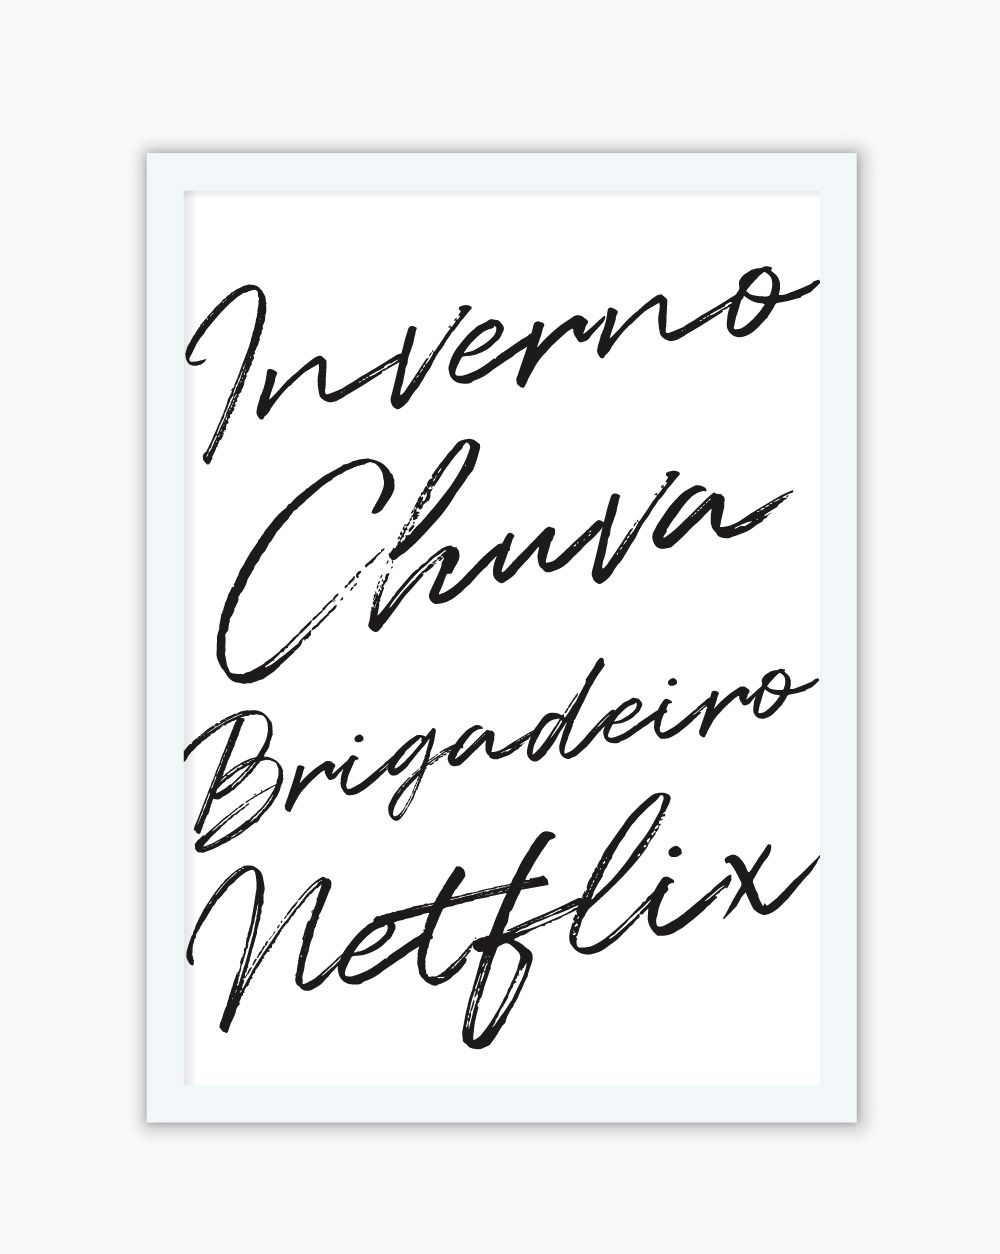 Quadro Inverno, Chuva, Brigadeiro & Netflix